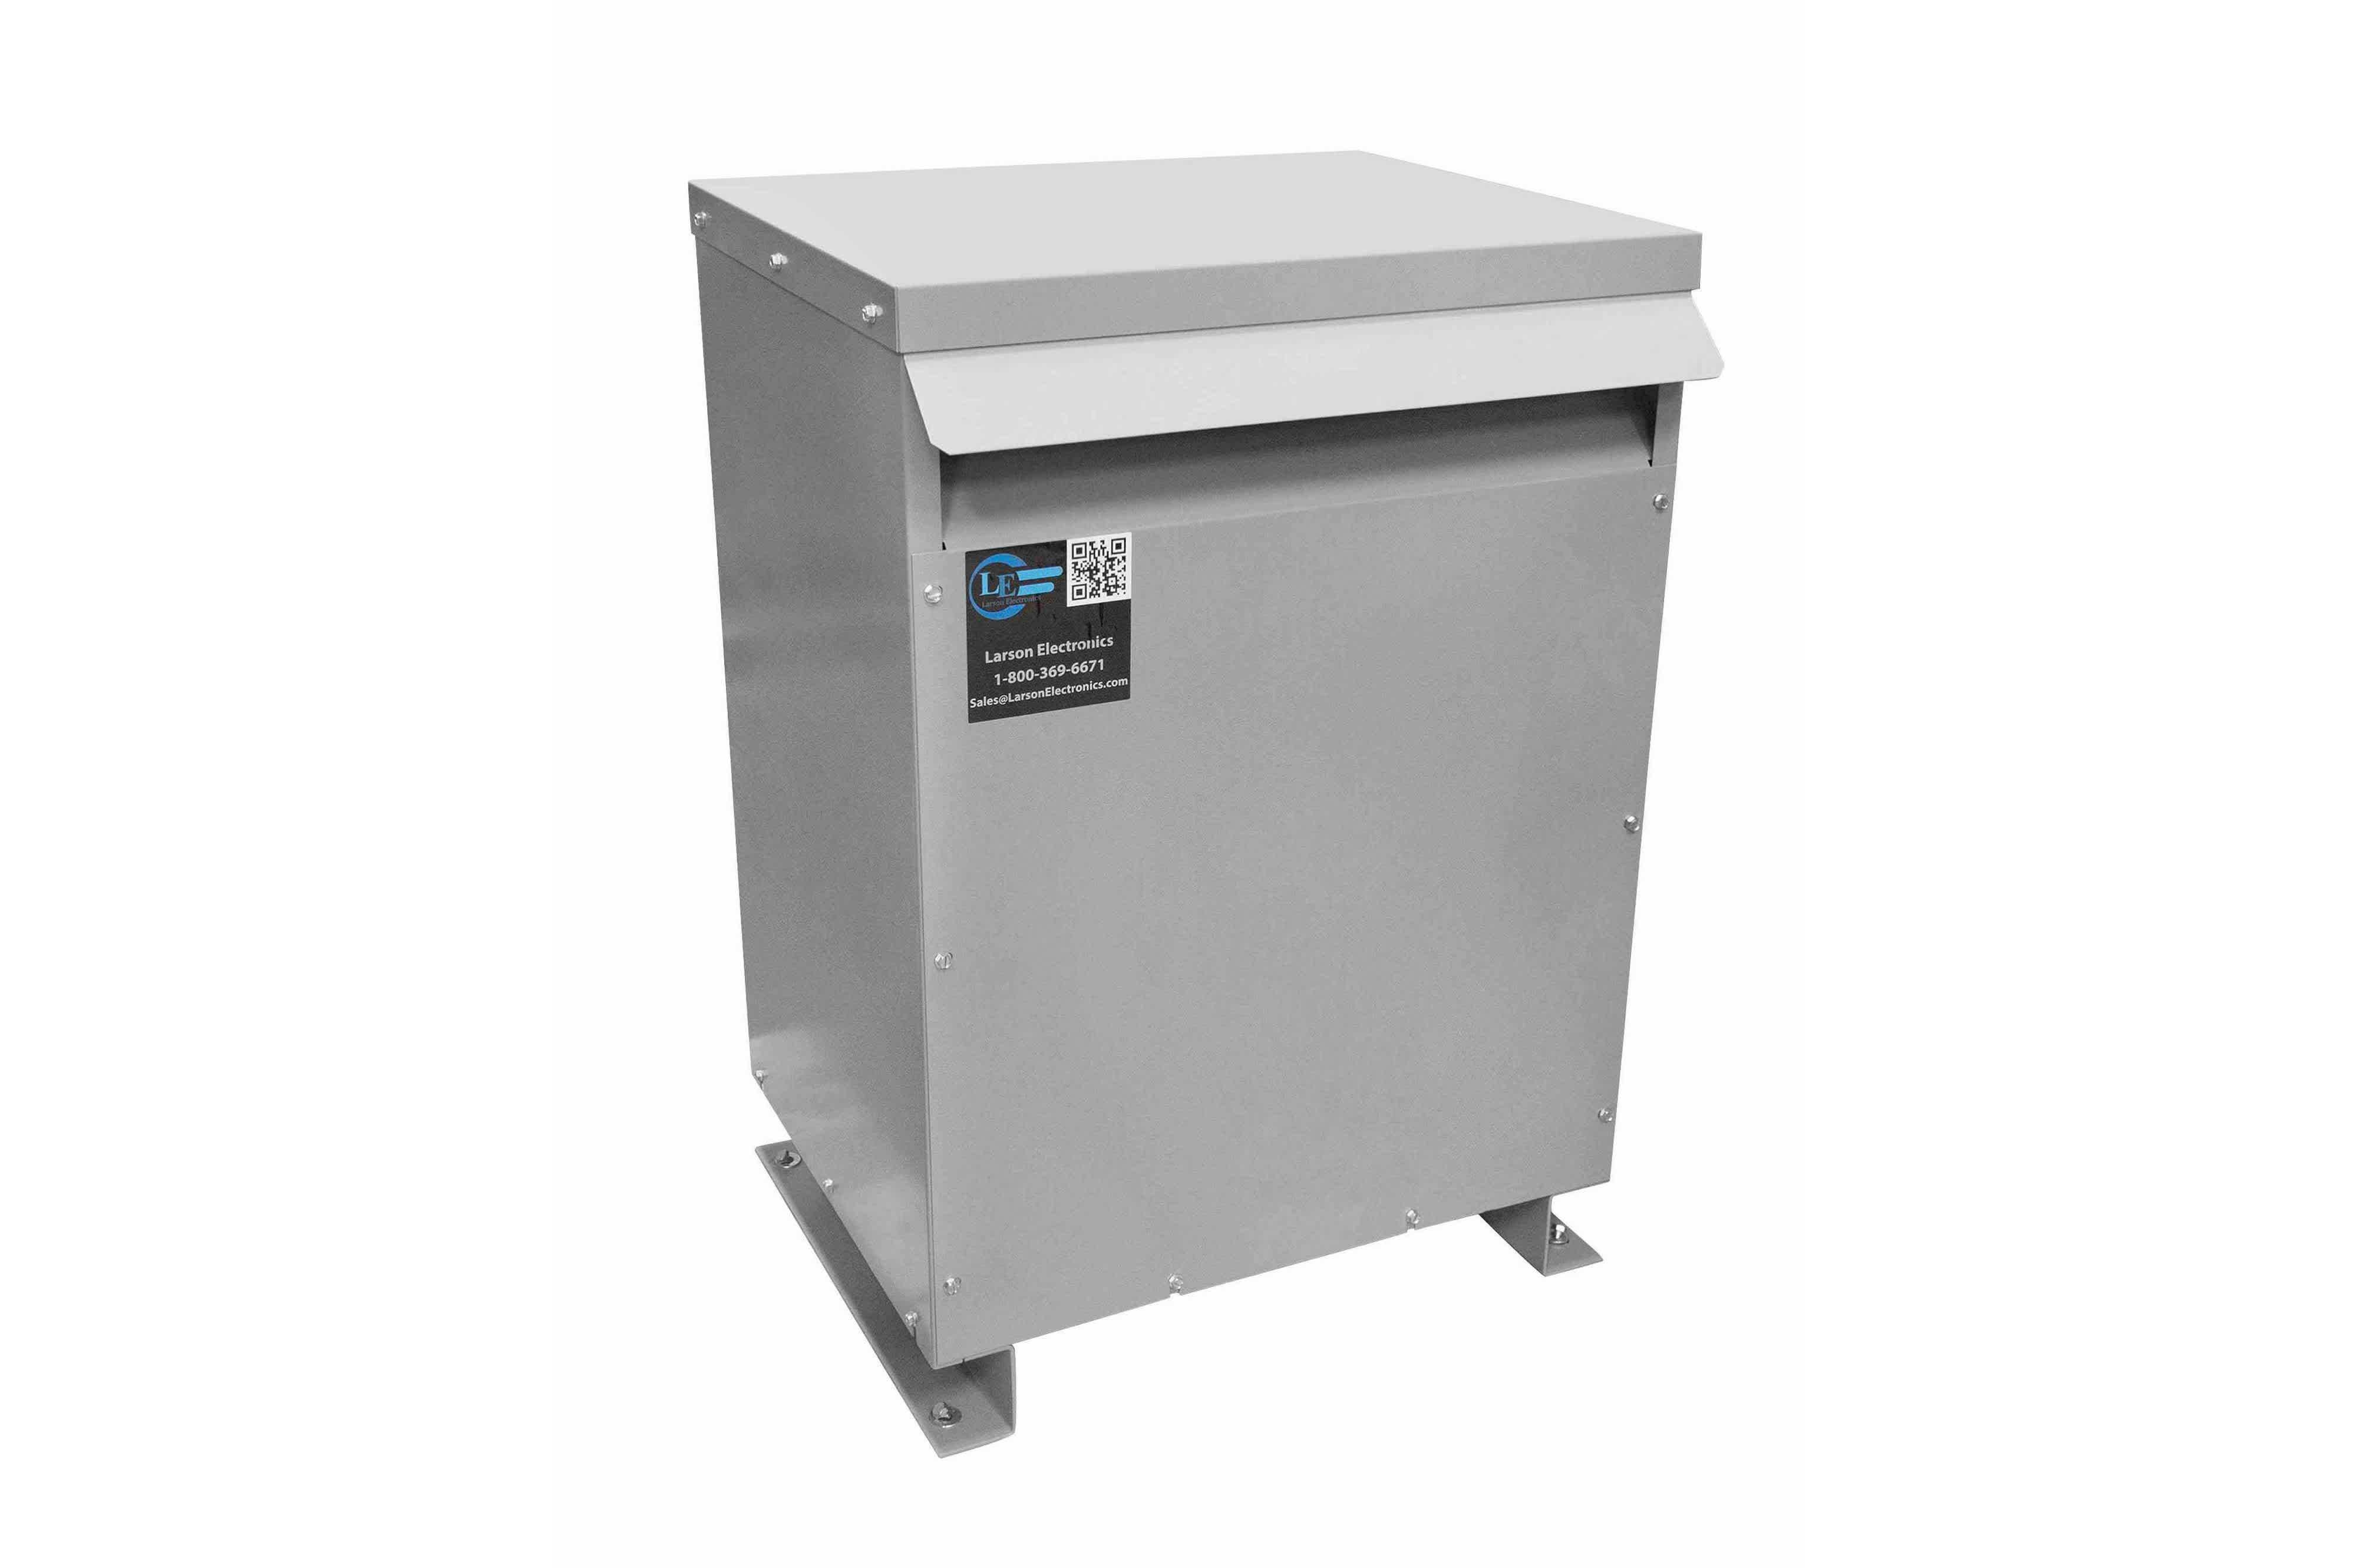 35 kVA 3PH Isolation Transformer, 208V Wye Primary, 400Y/231 Wye-N Secondary, N3R, Ventilated, 60 Hz